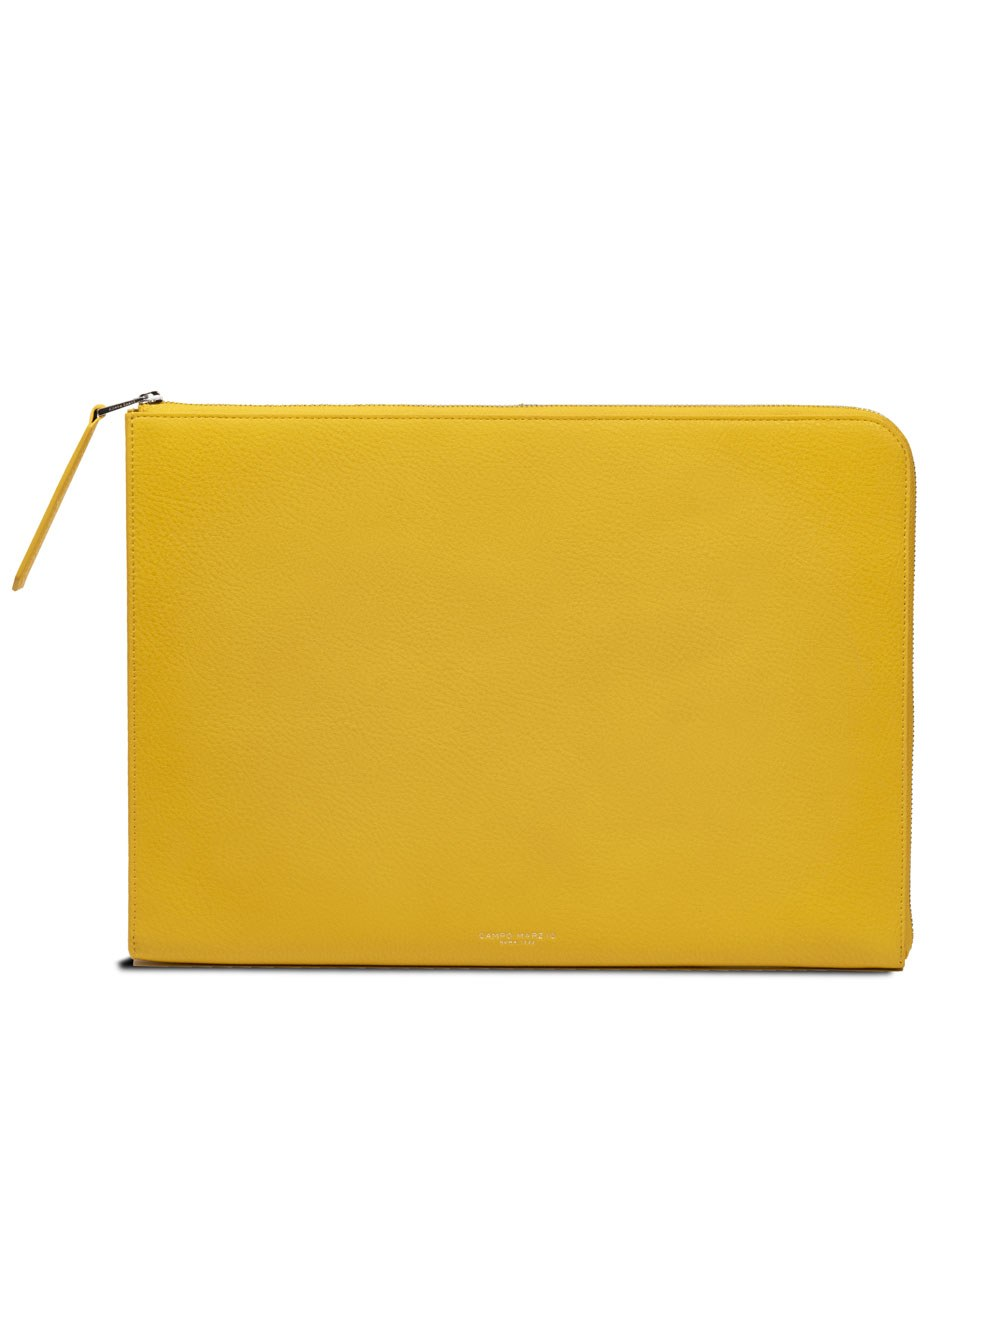 "Laptop Sleeve 16"" - Canary Yellow"